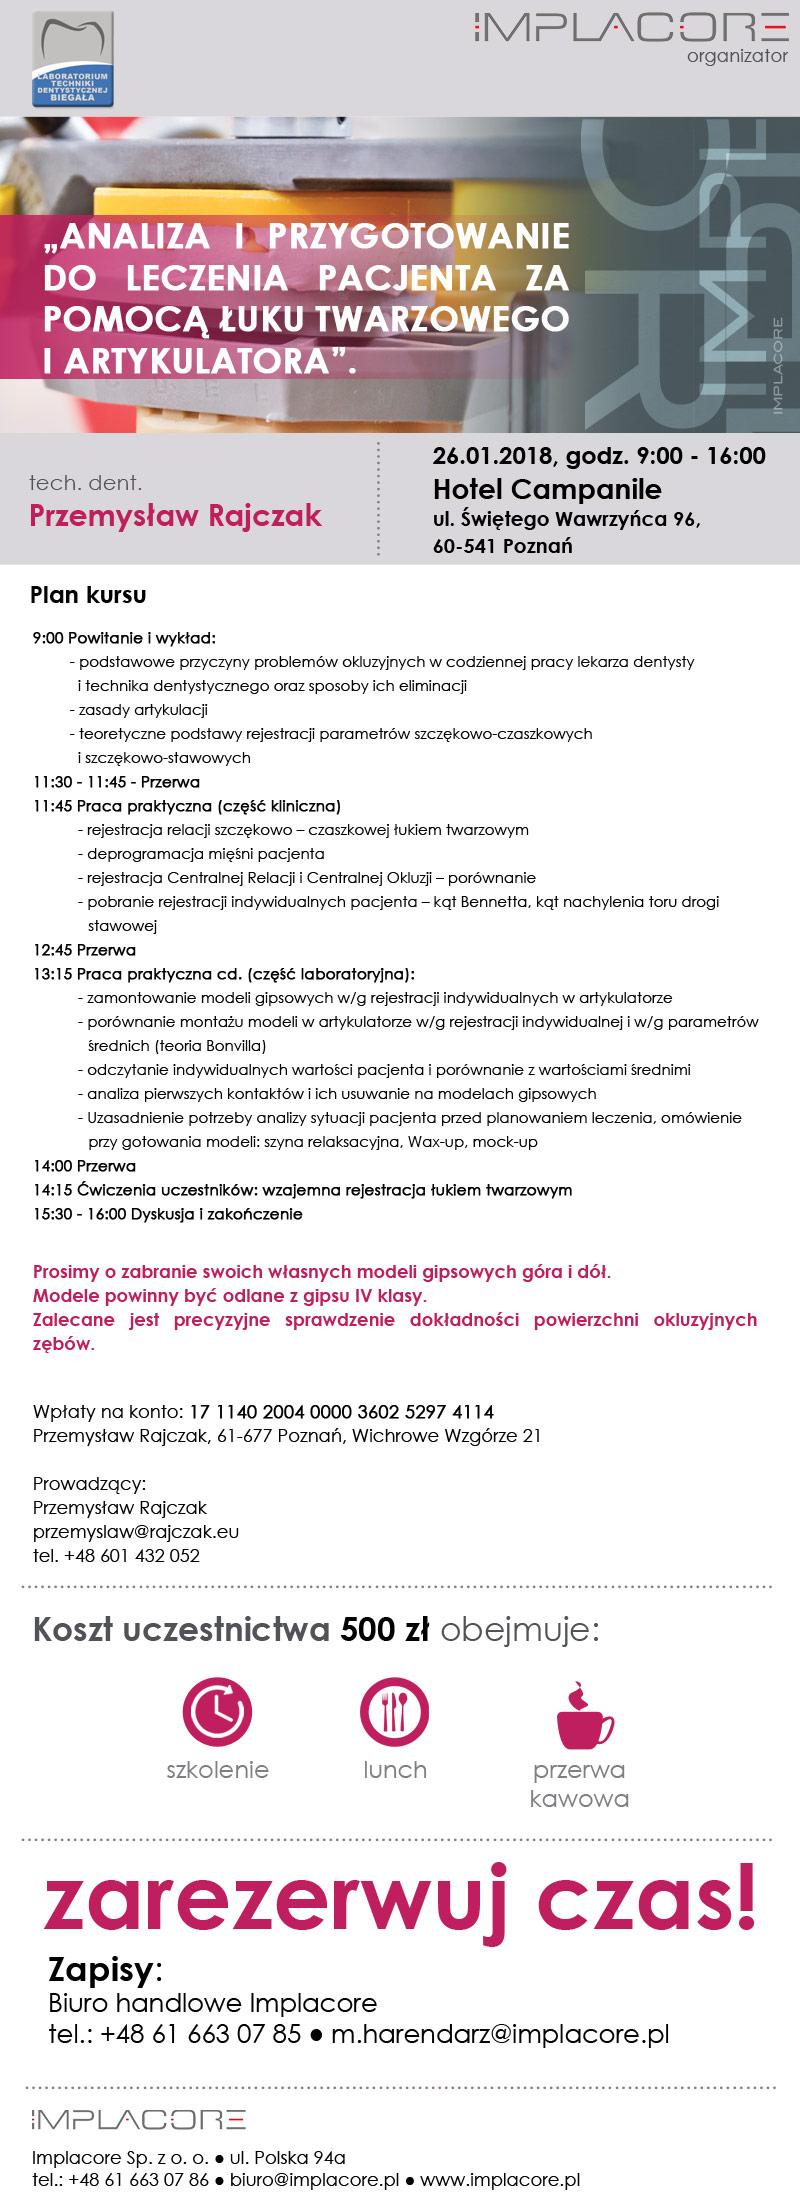 newsletterARTYKULATOR_I-2018_800px